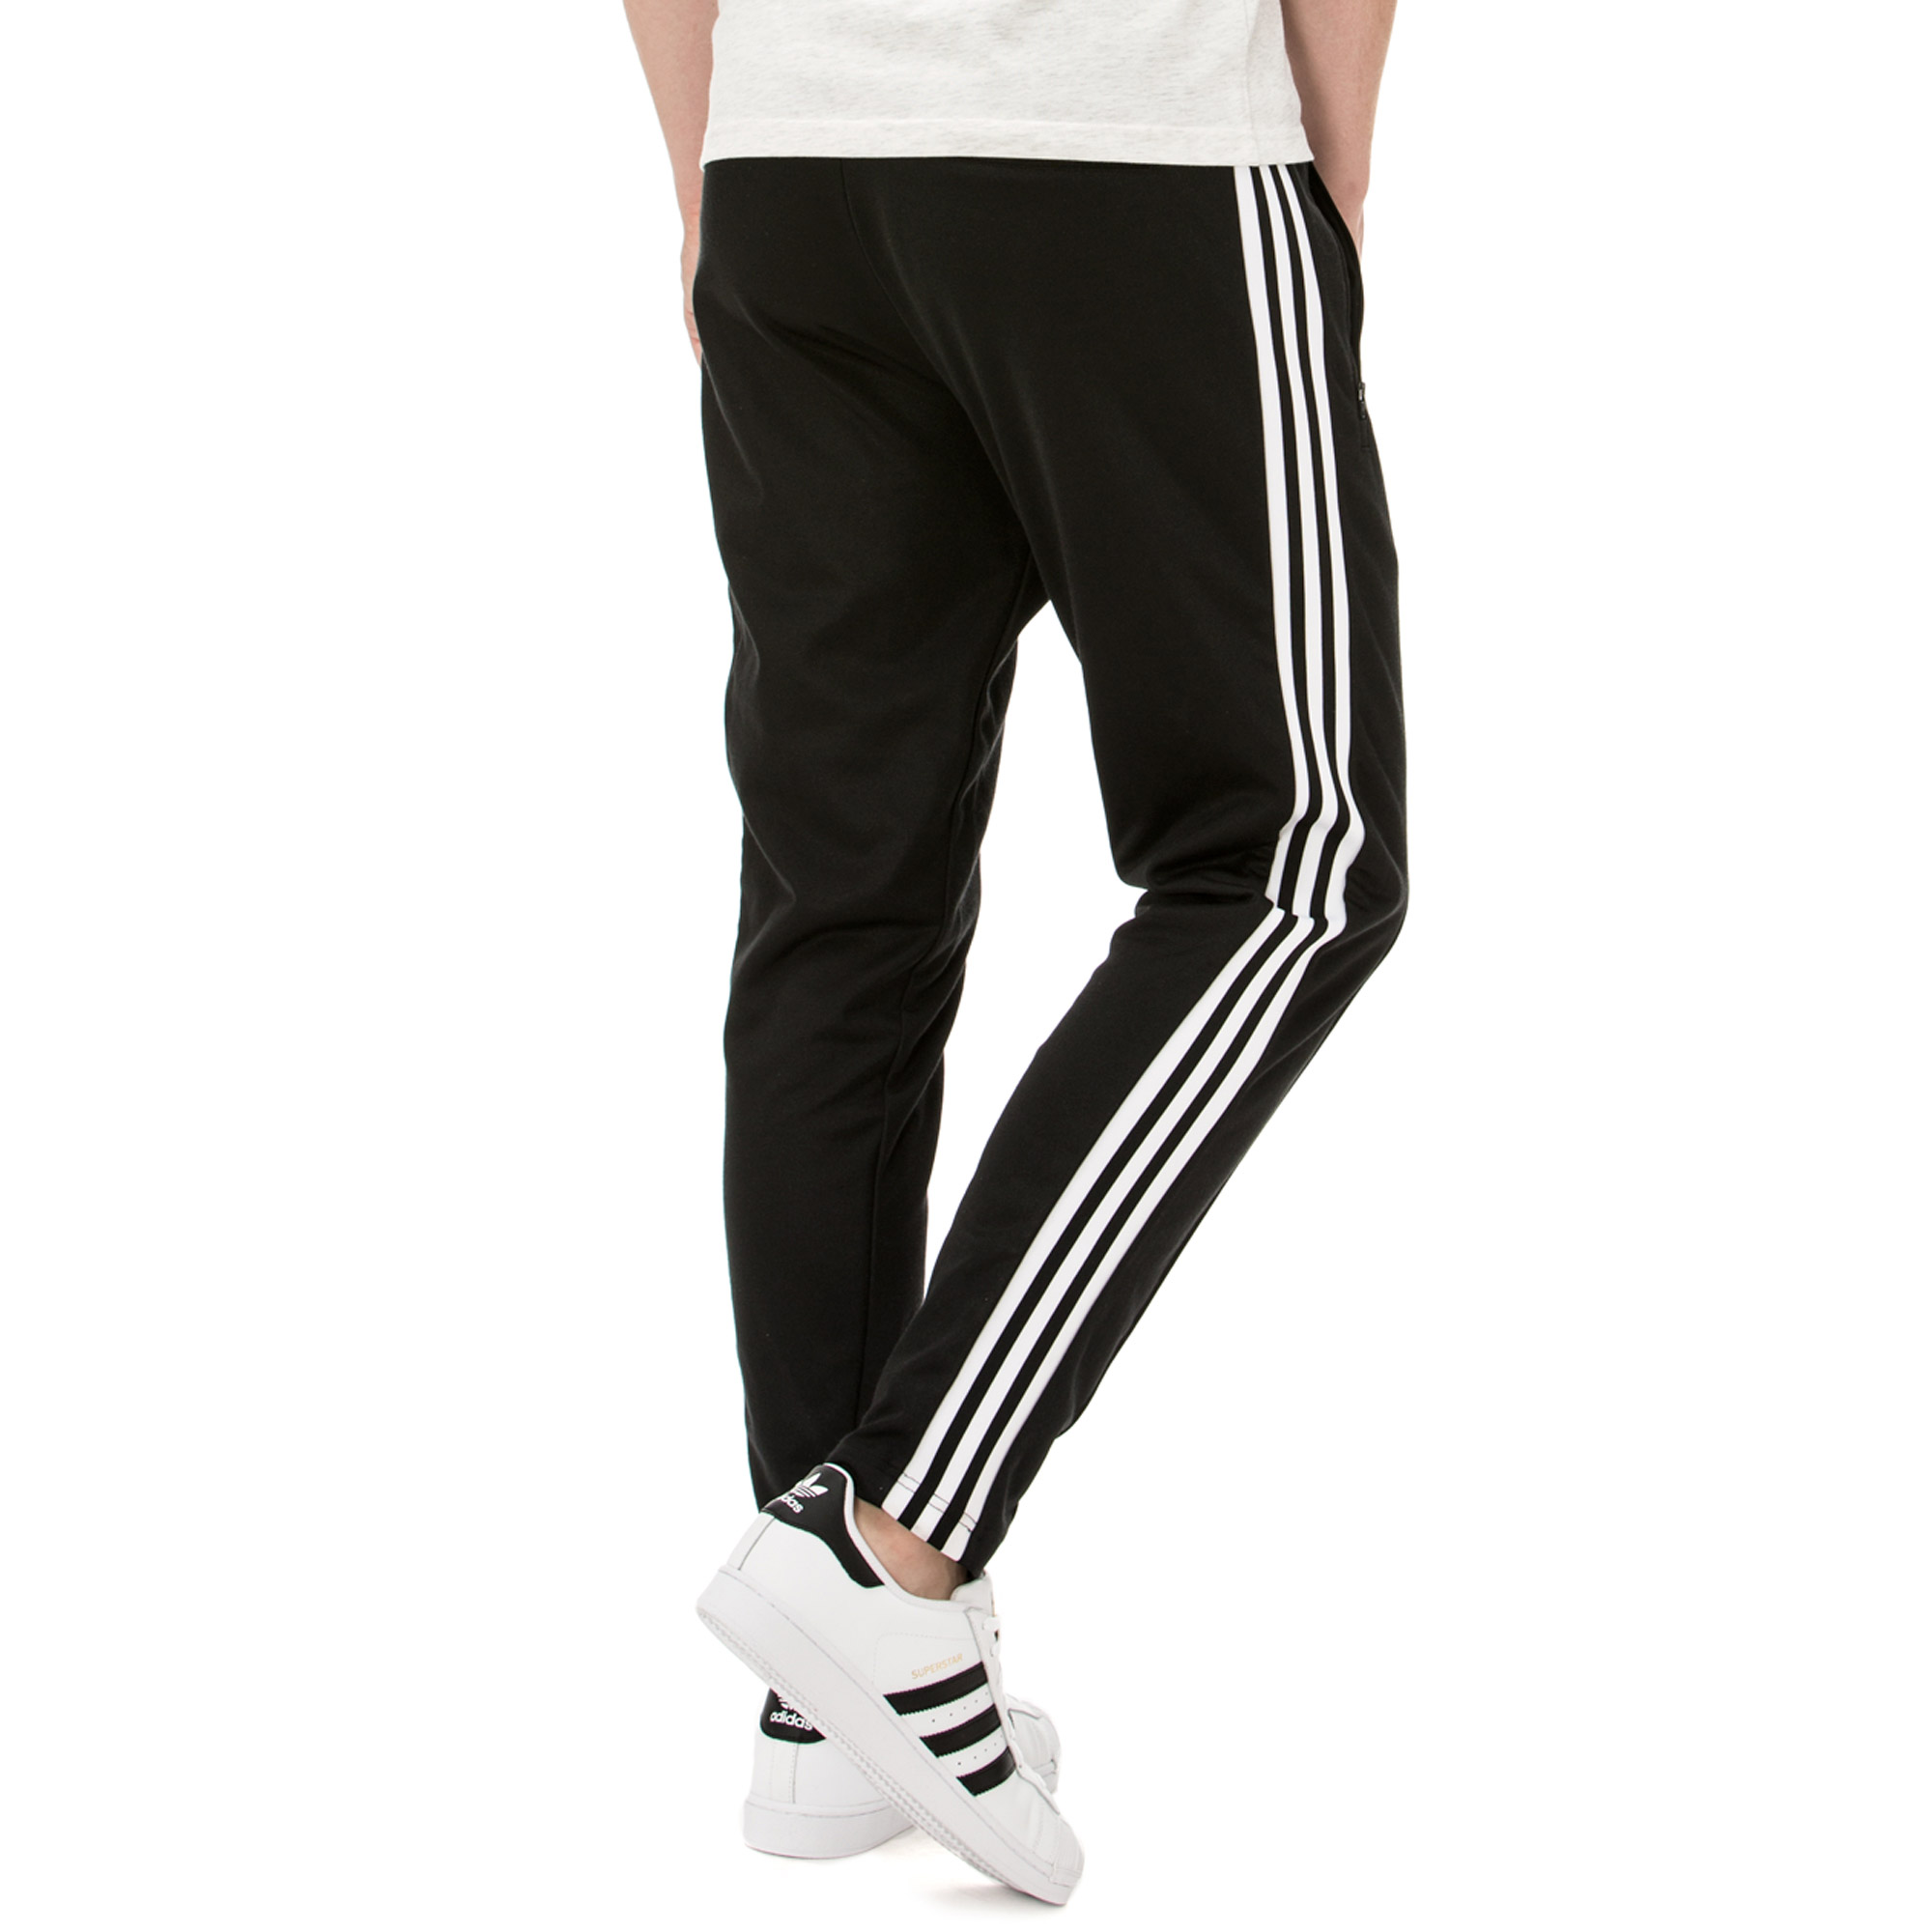 nuez Puno Malawi  adidas BB Erkek Siyah Eşofman Altı Erkek Eşofman 3146295 | SuperStep